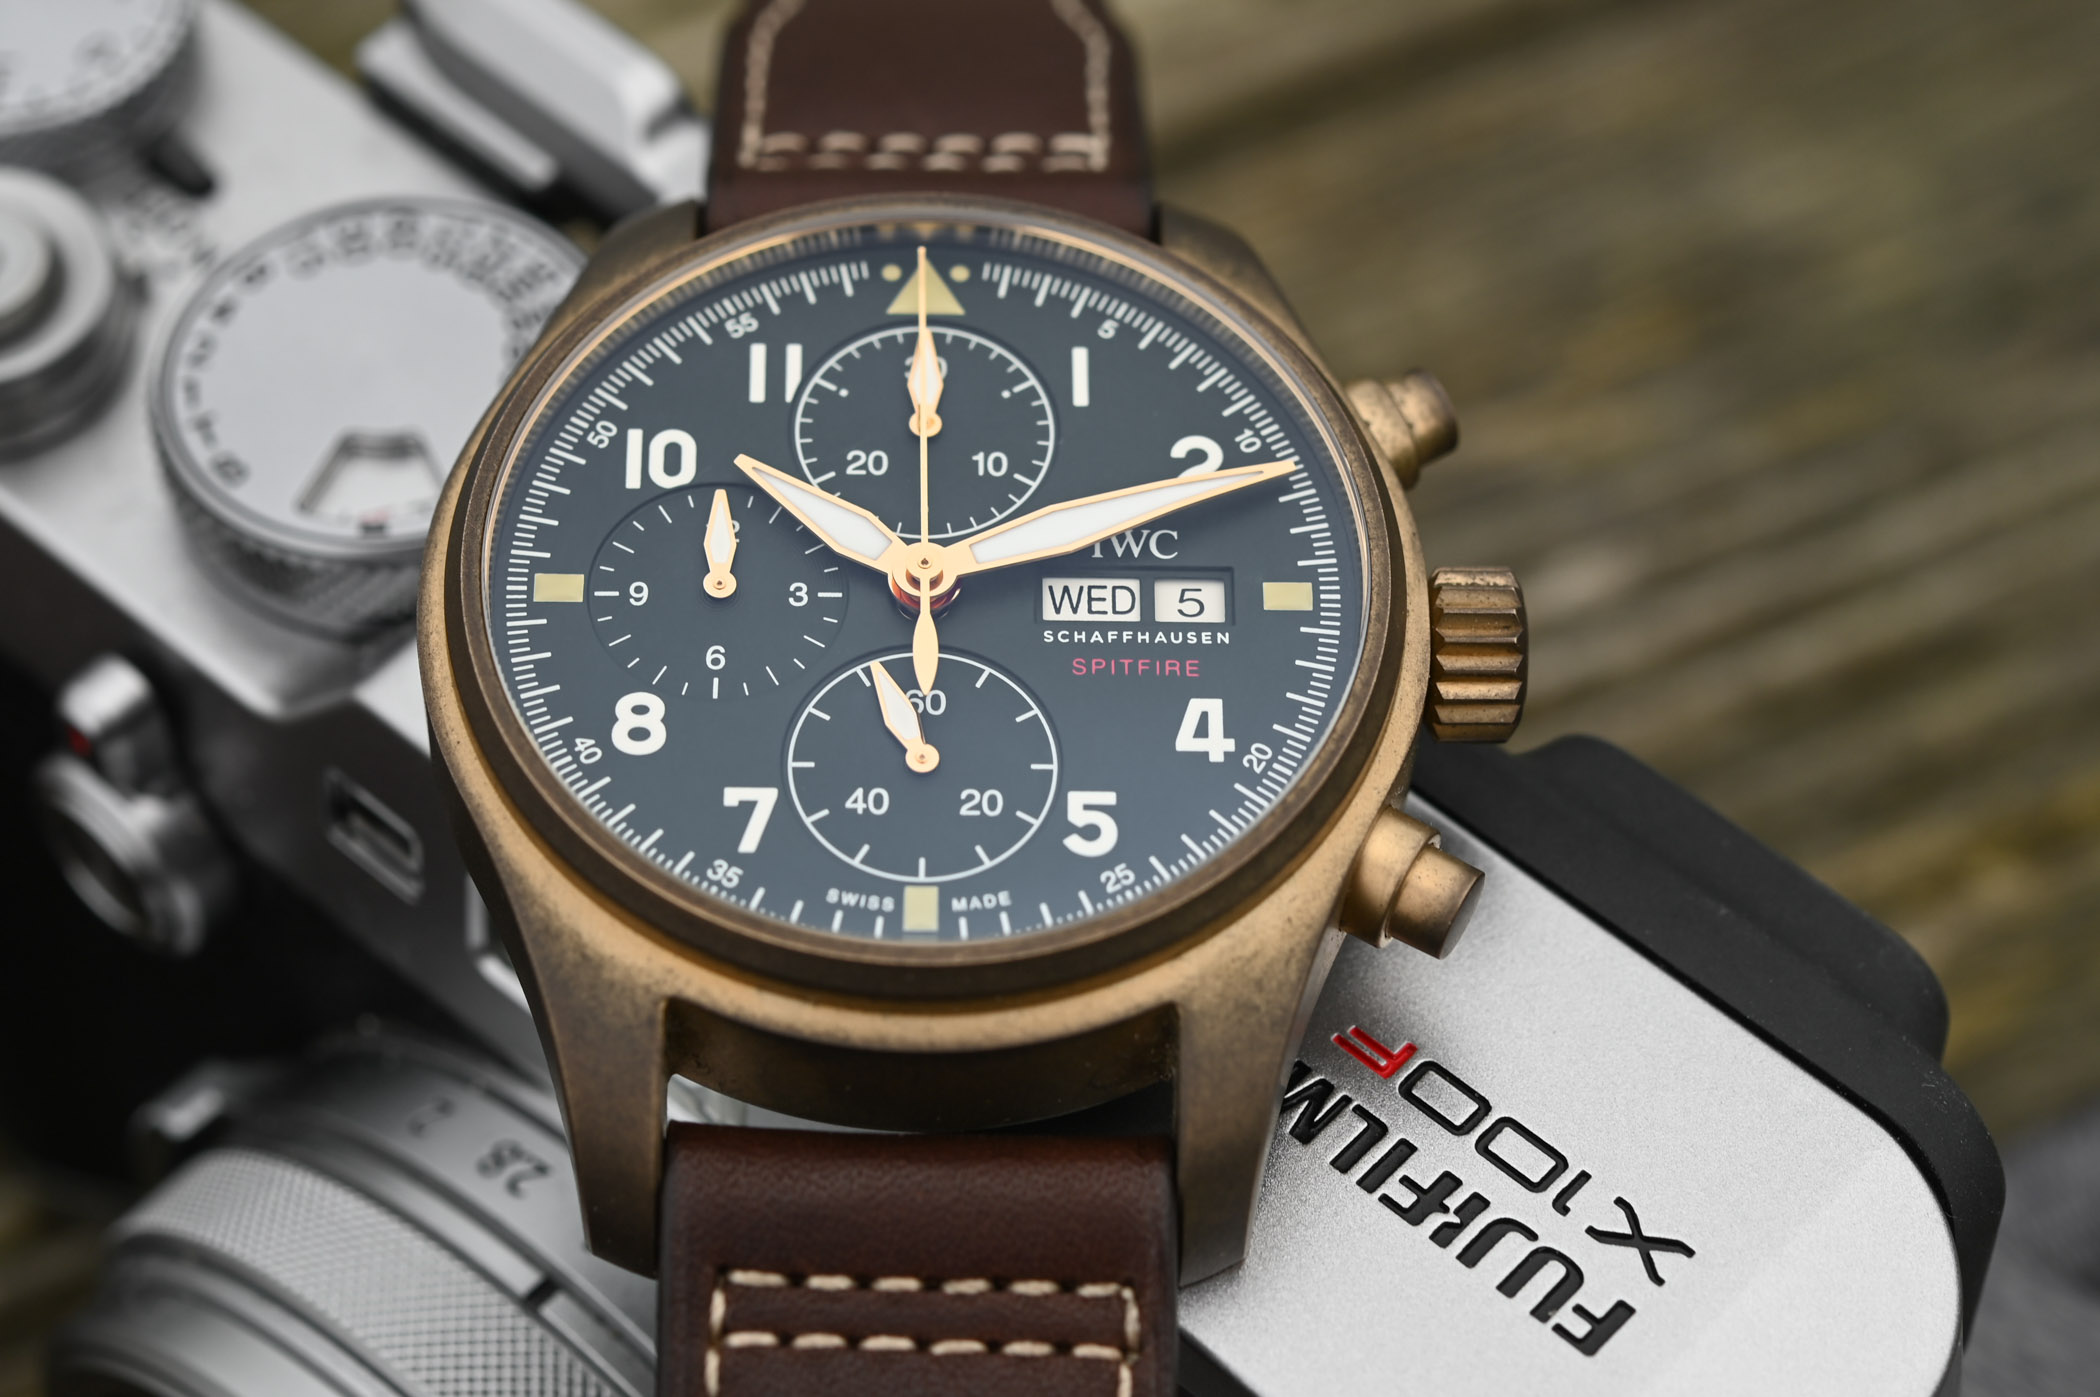 IWC Pilots Watch Chronograph Spitfire Bronze IW387902 - SIHH 2019